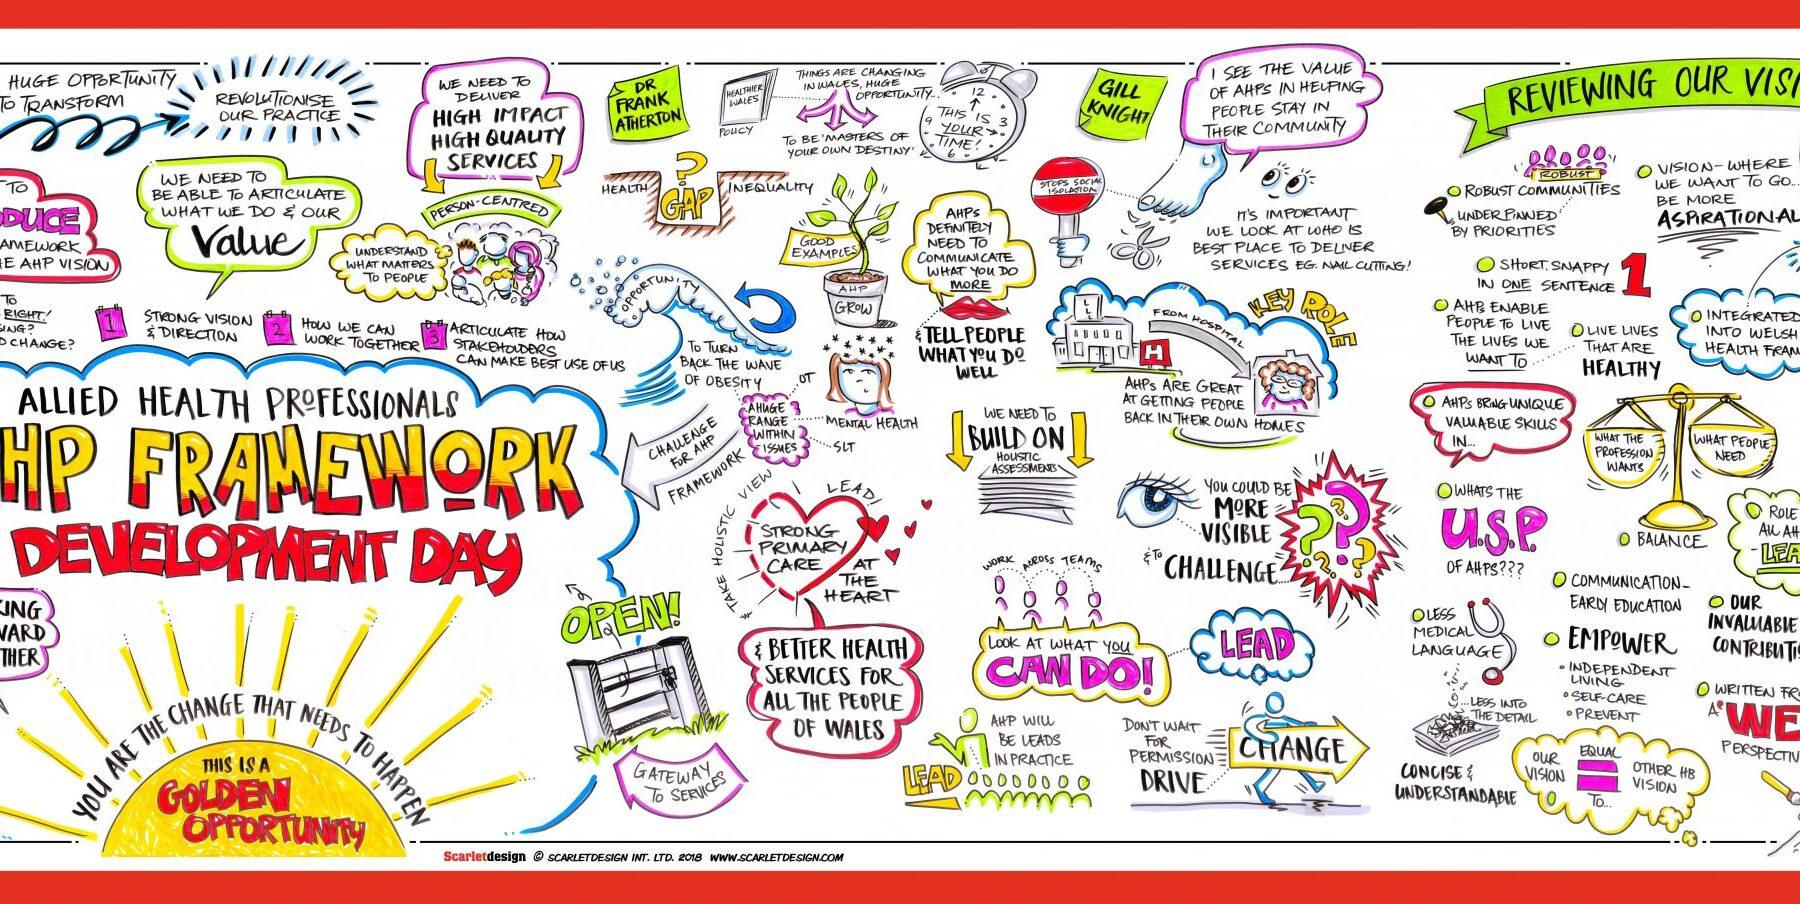 AHP Framework Development Day